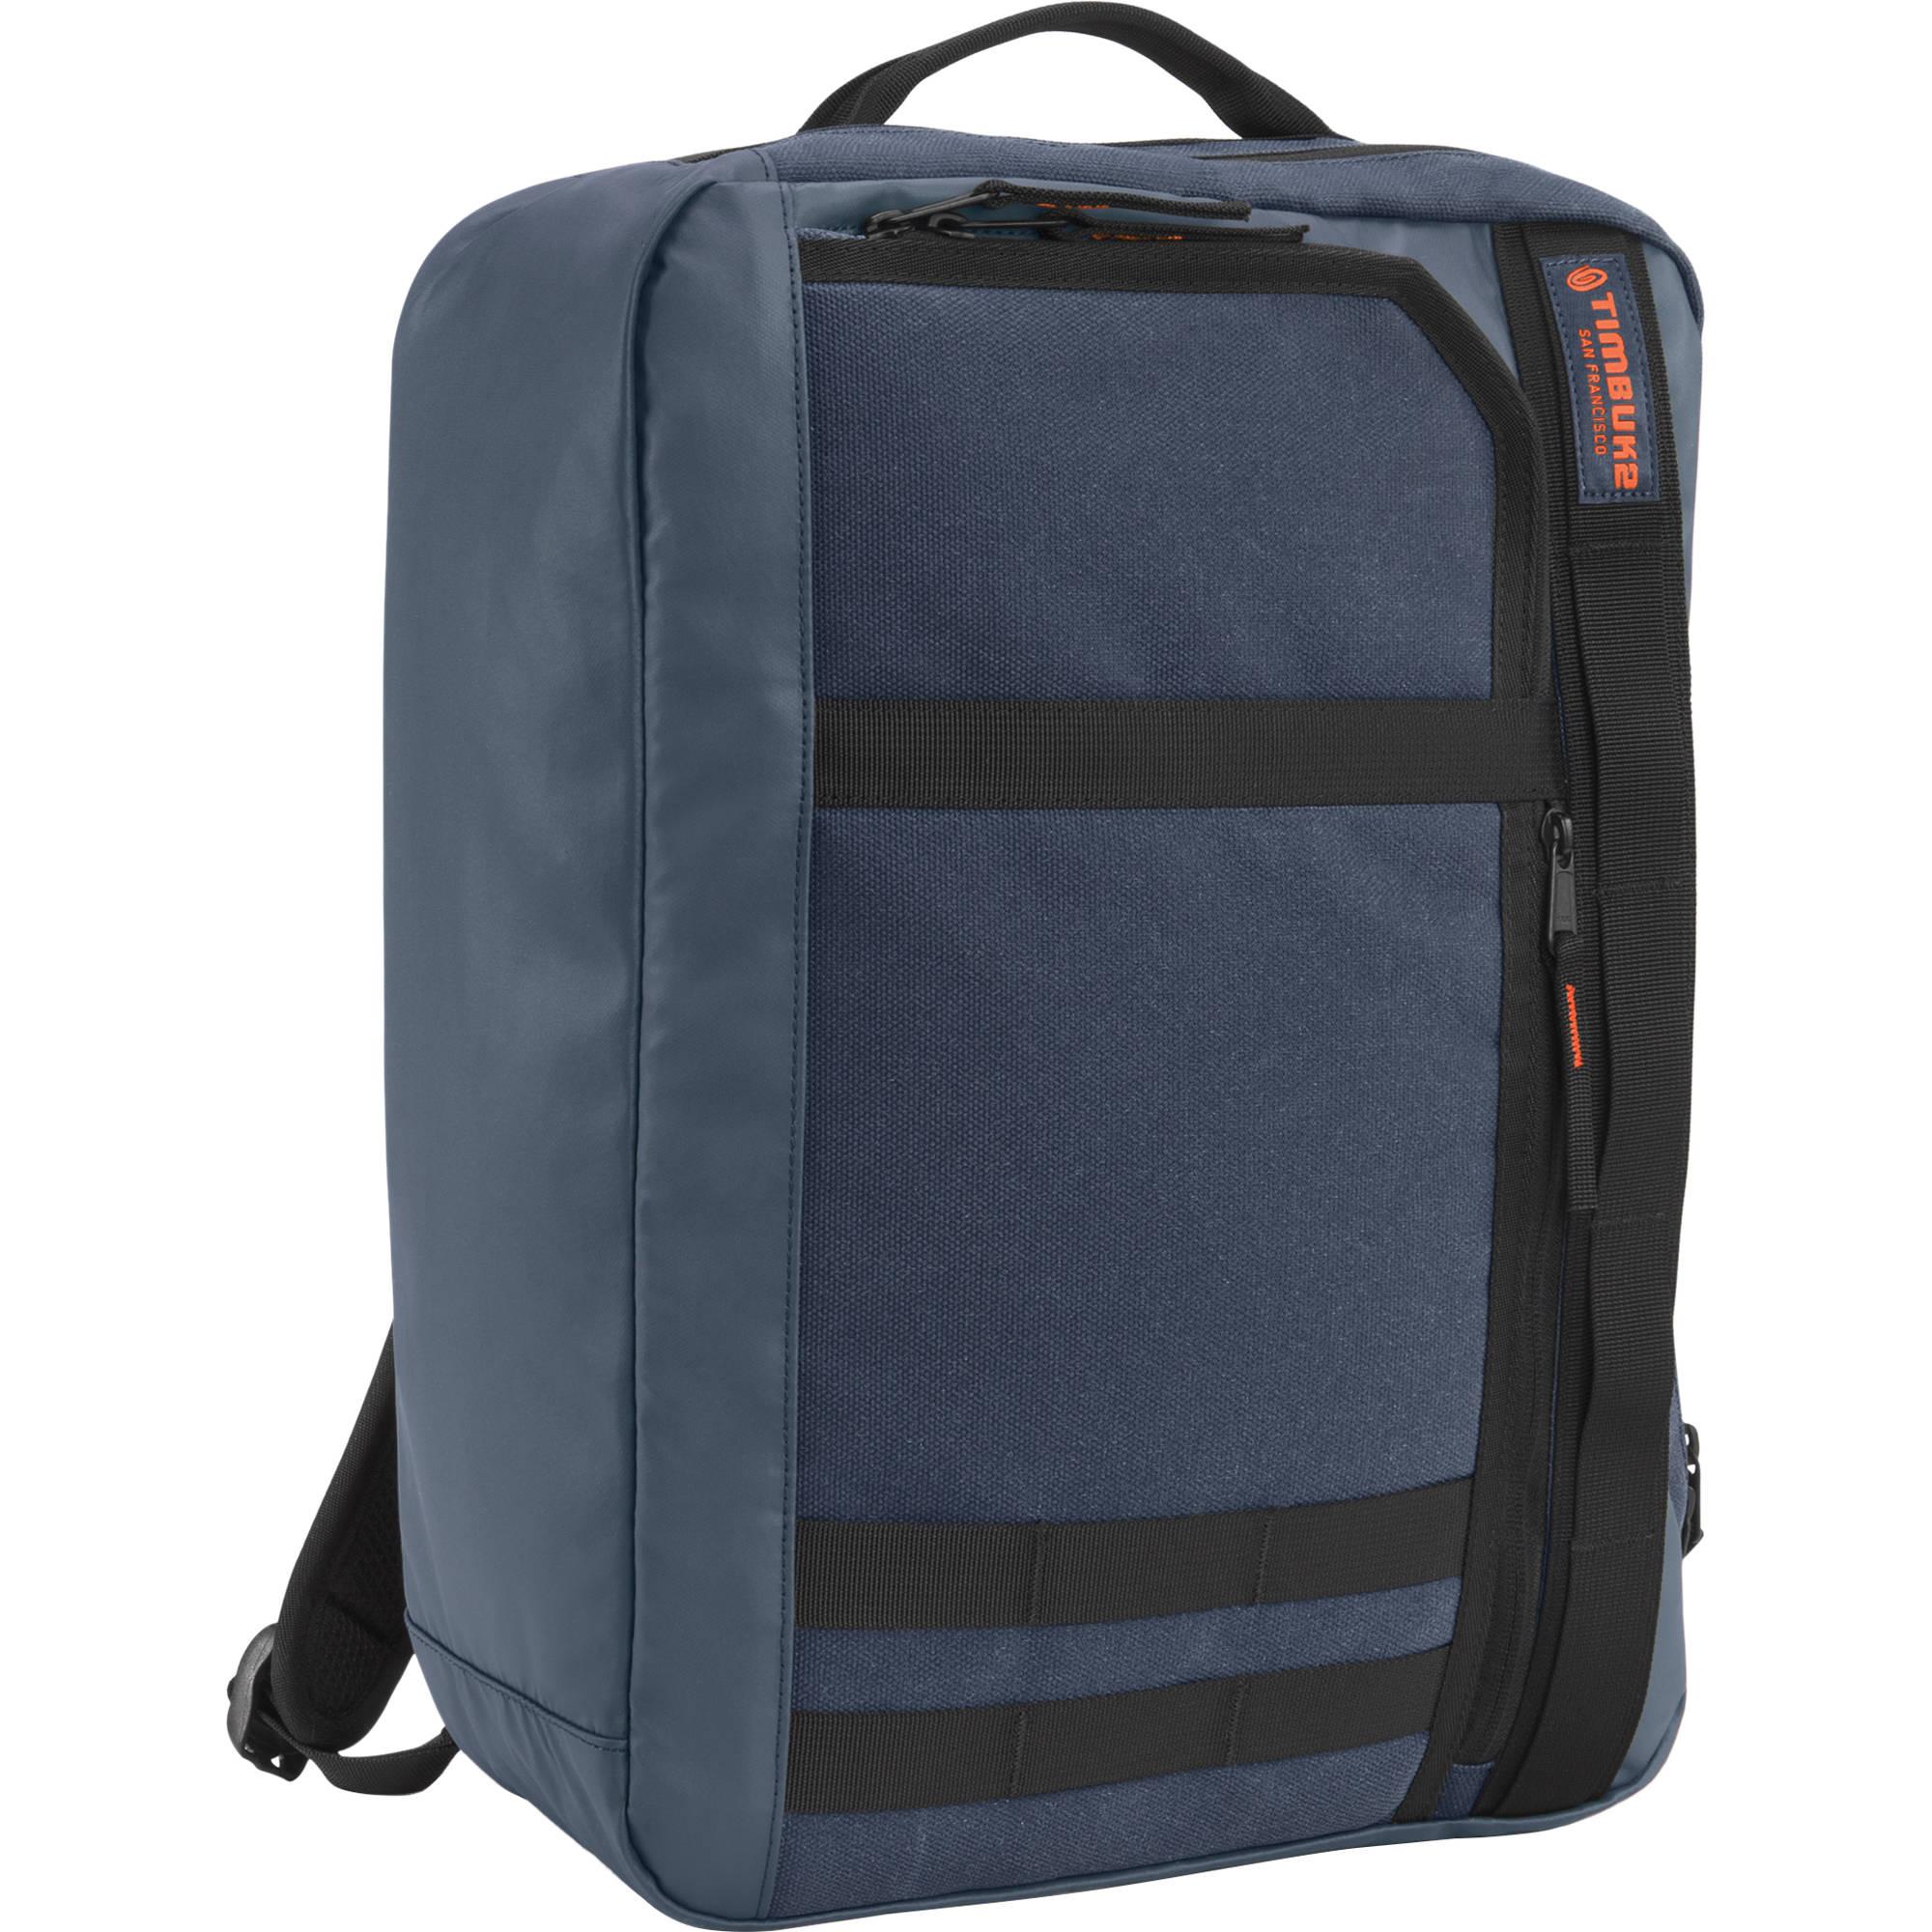 bcbb0d3c109 Timbuk2 Ace Laptop Backpack Messenger Bag 354-4-4160 B H Photo